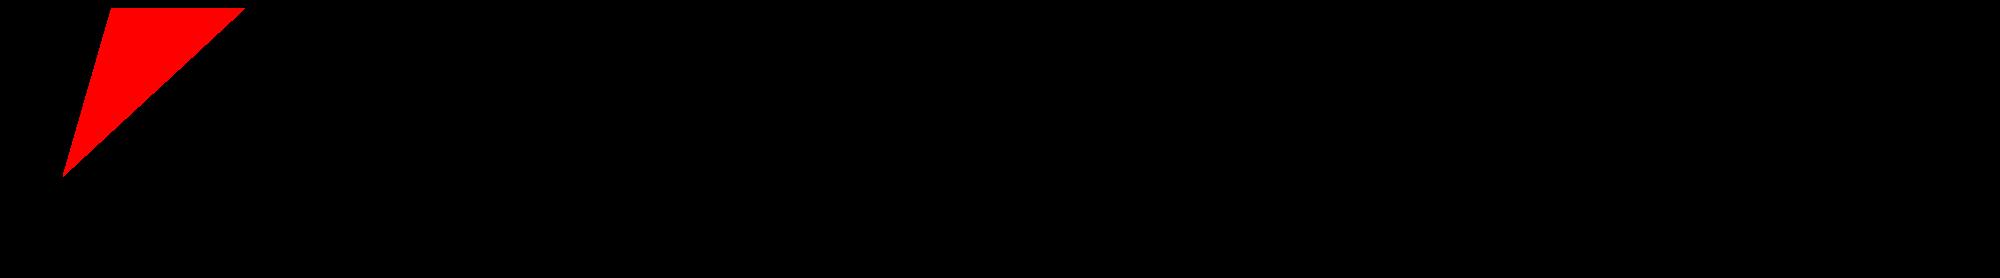 image bridgestone logopng logopedia the logo and